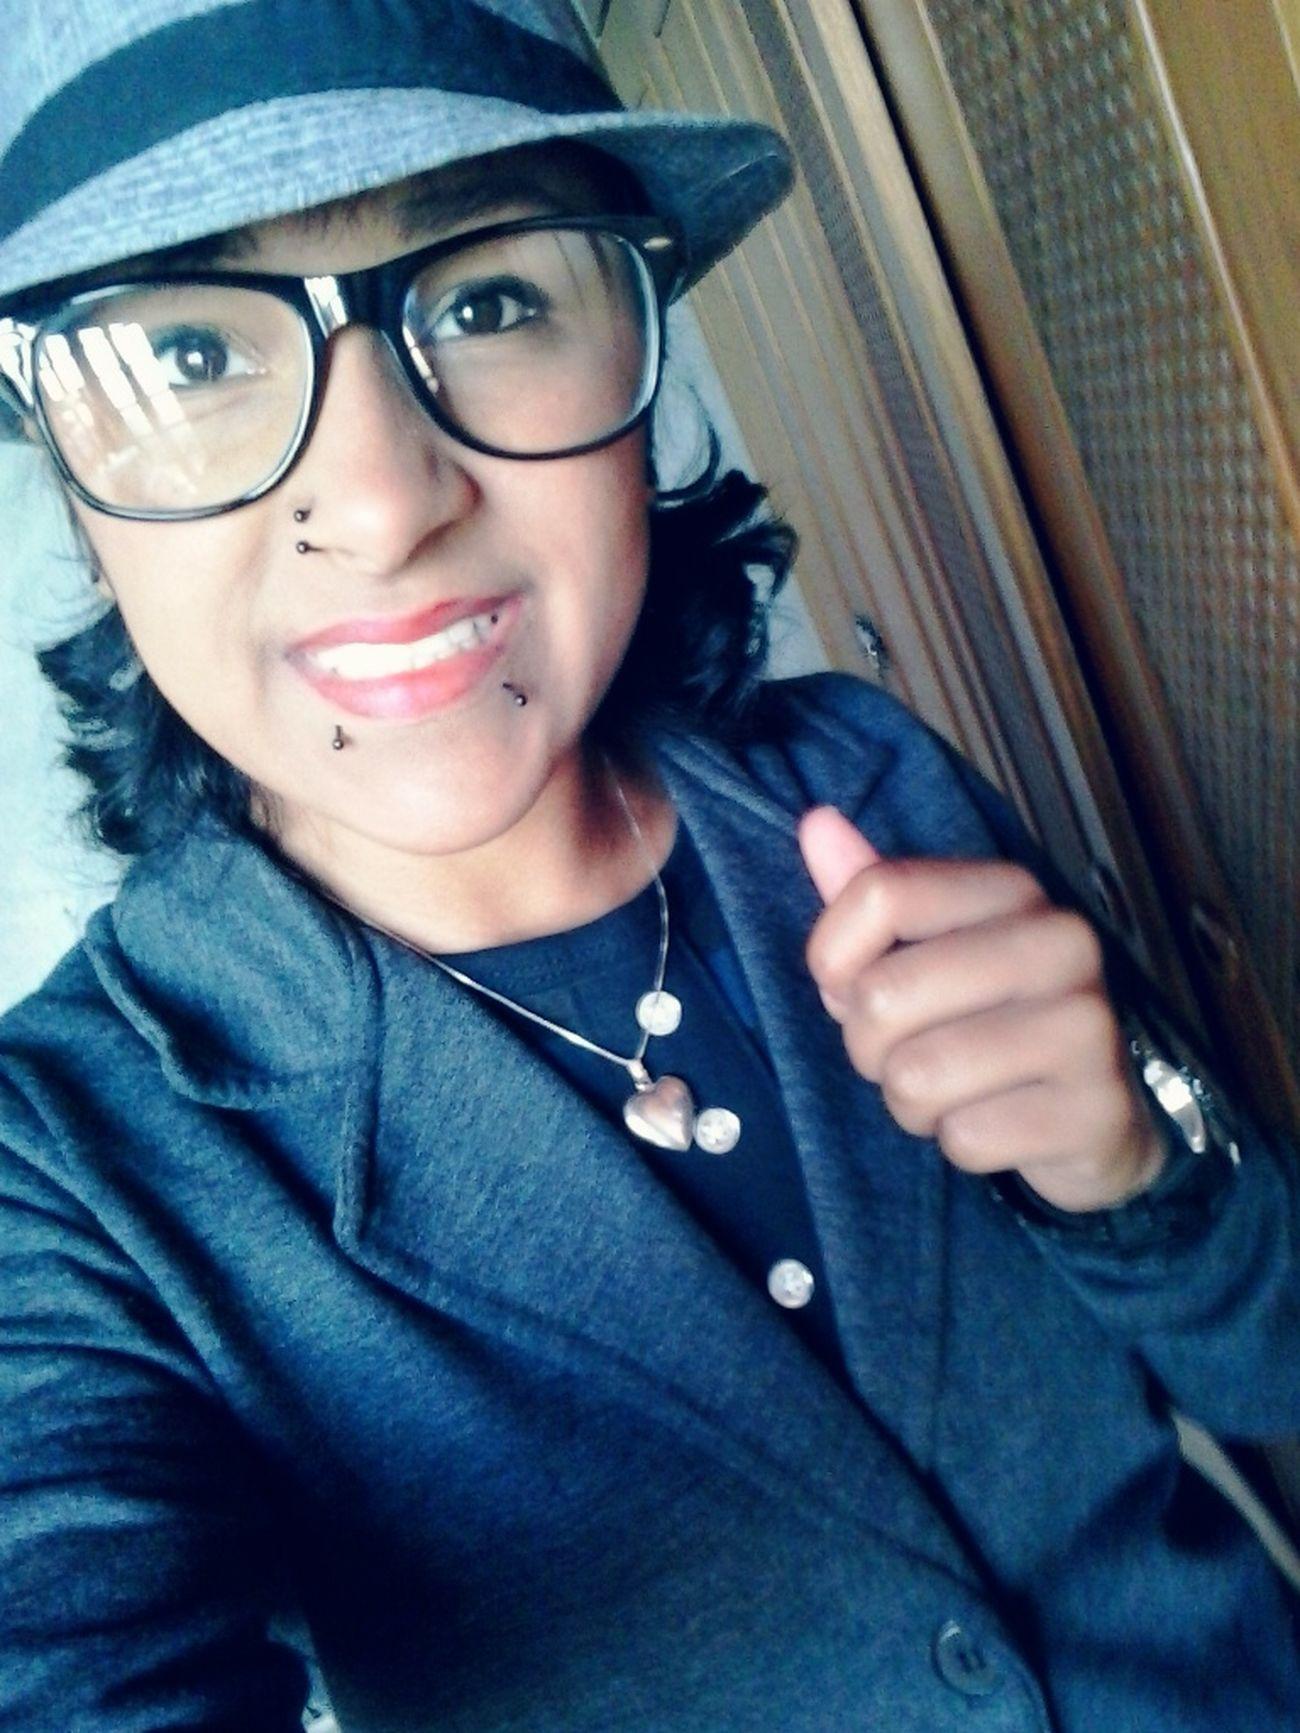 Meu sorriso continua sempre pq eu sou feliz... First Eyeem Photo